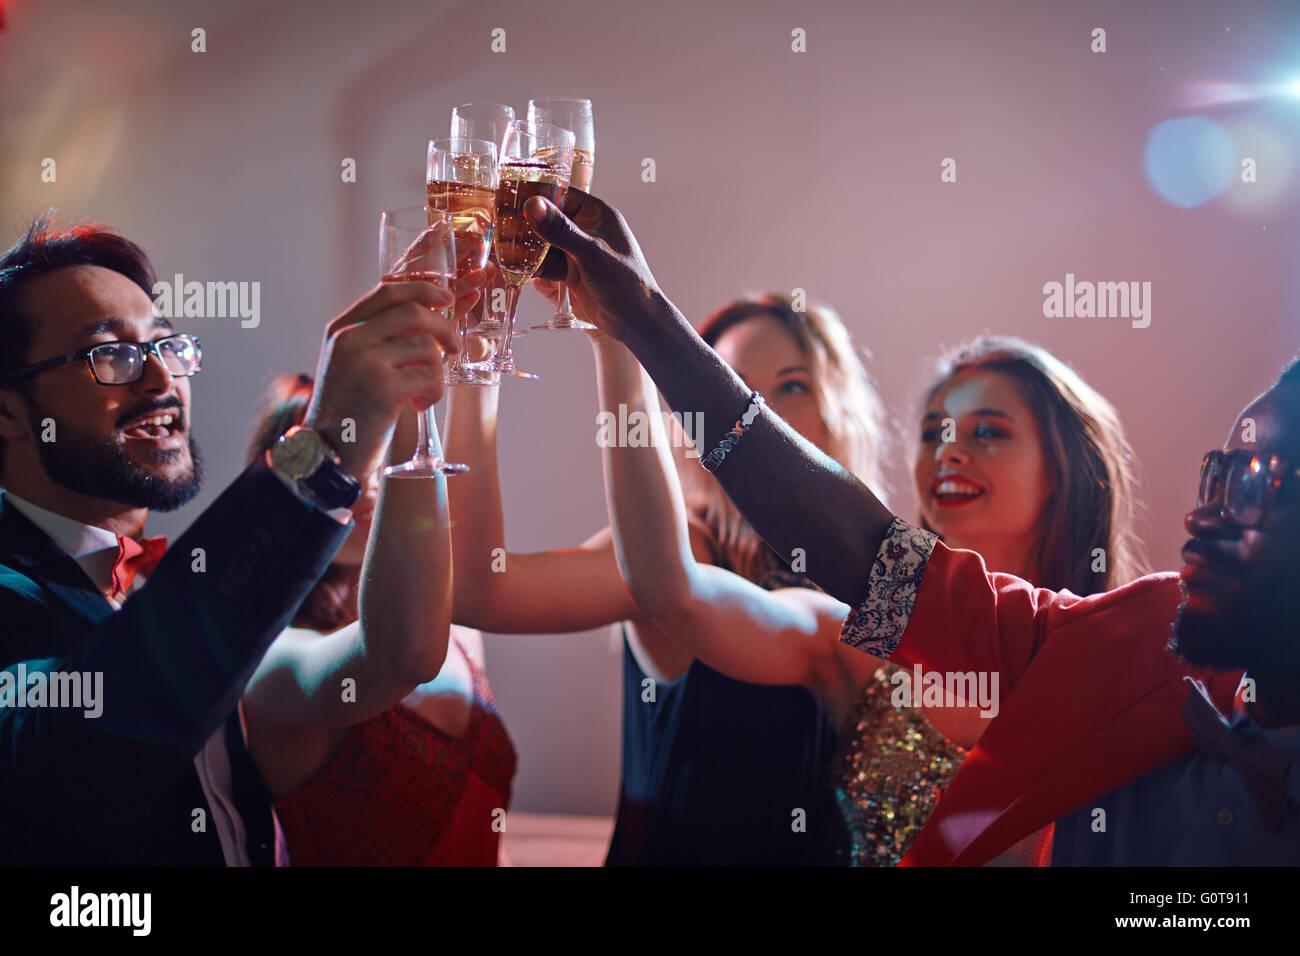 Booze - Stock Image